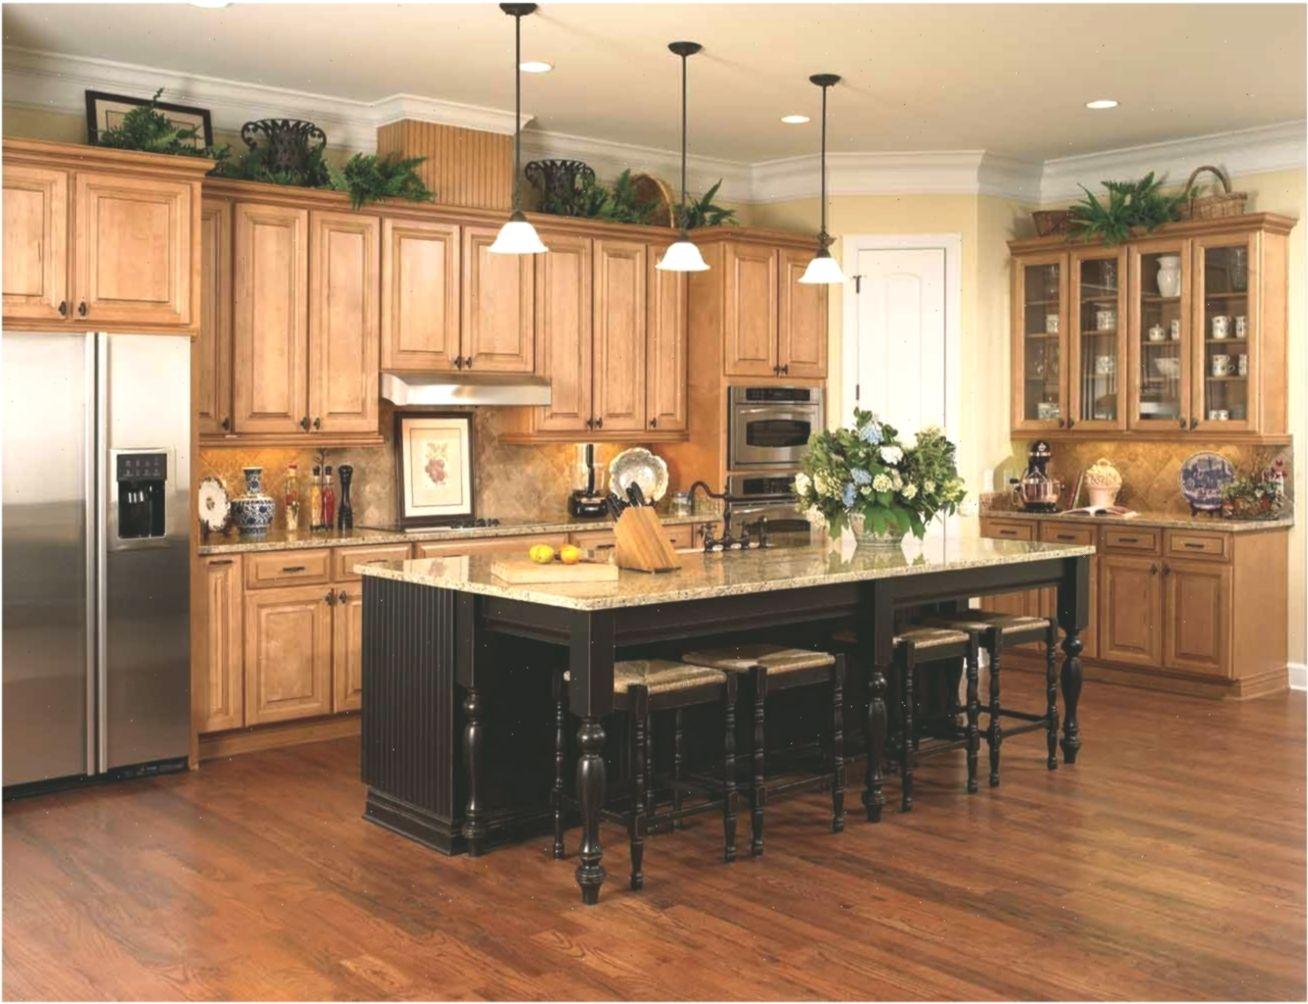 Maple Wood Kitchen Cabinets Beautiful Dark Maple Kitchen Kitchencabinets Beautiful Cabinets Dark Kist In 2020 Kitchen Cabinet Design Kitchen Wood Kitchen Cabinets